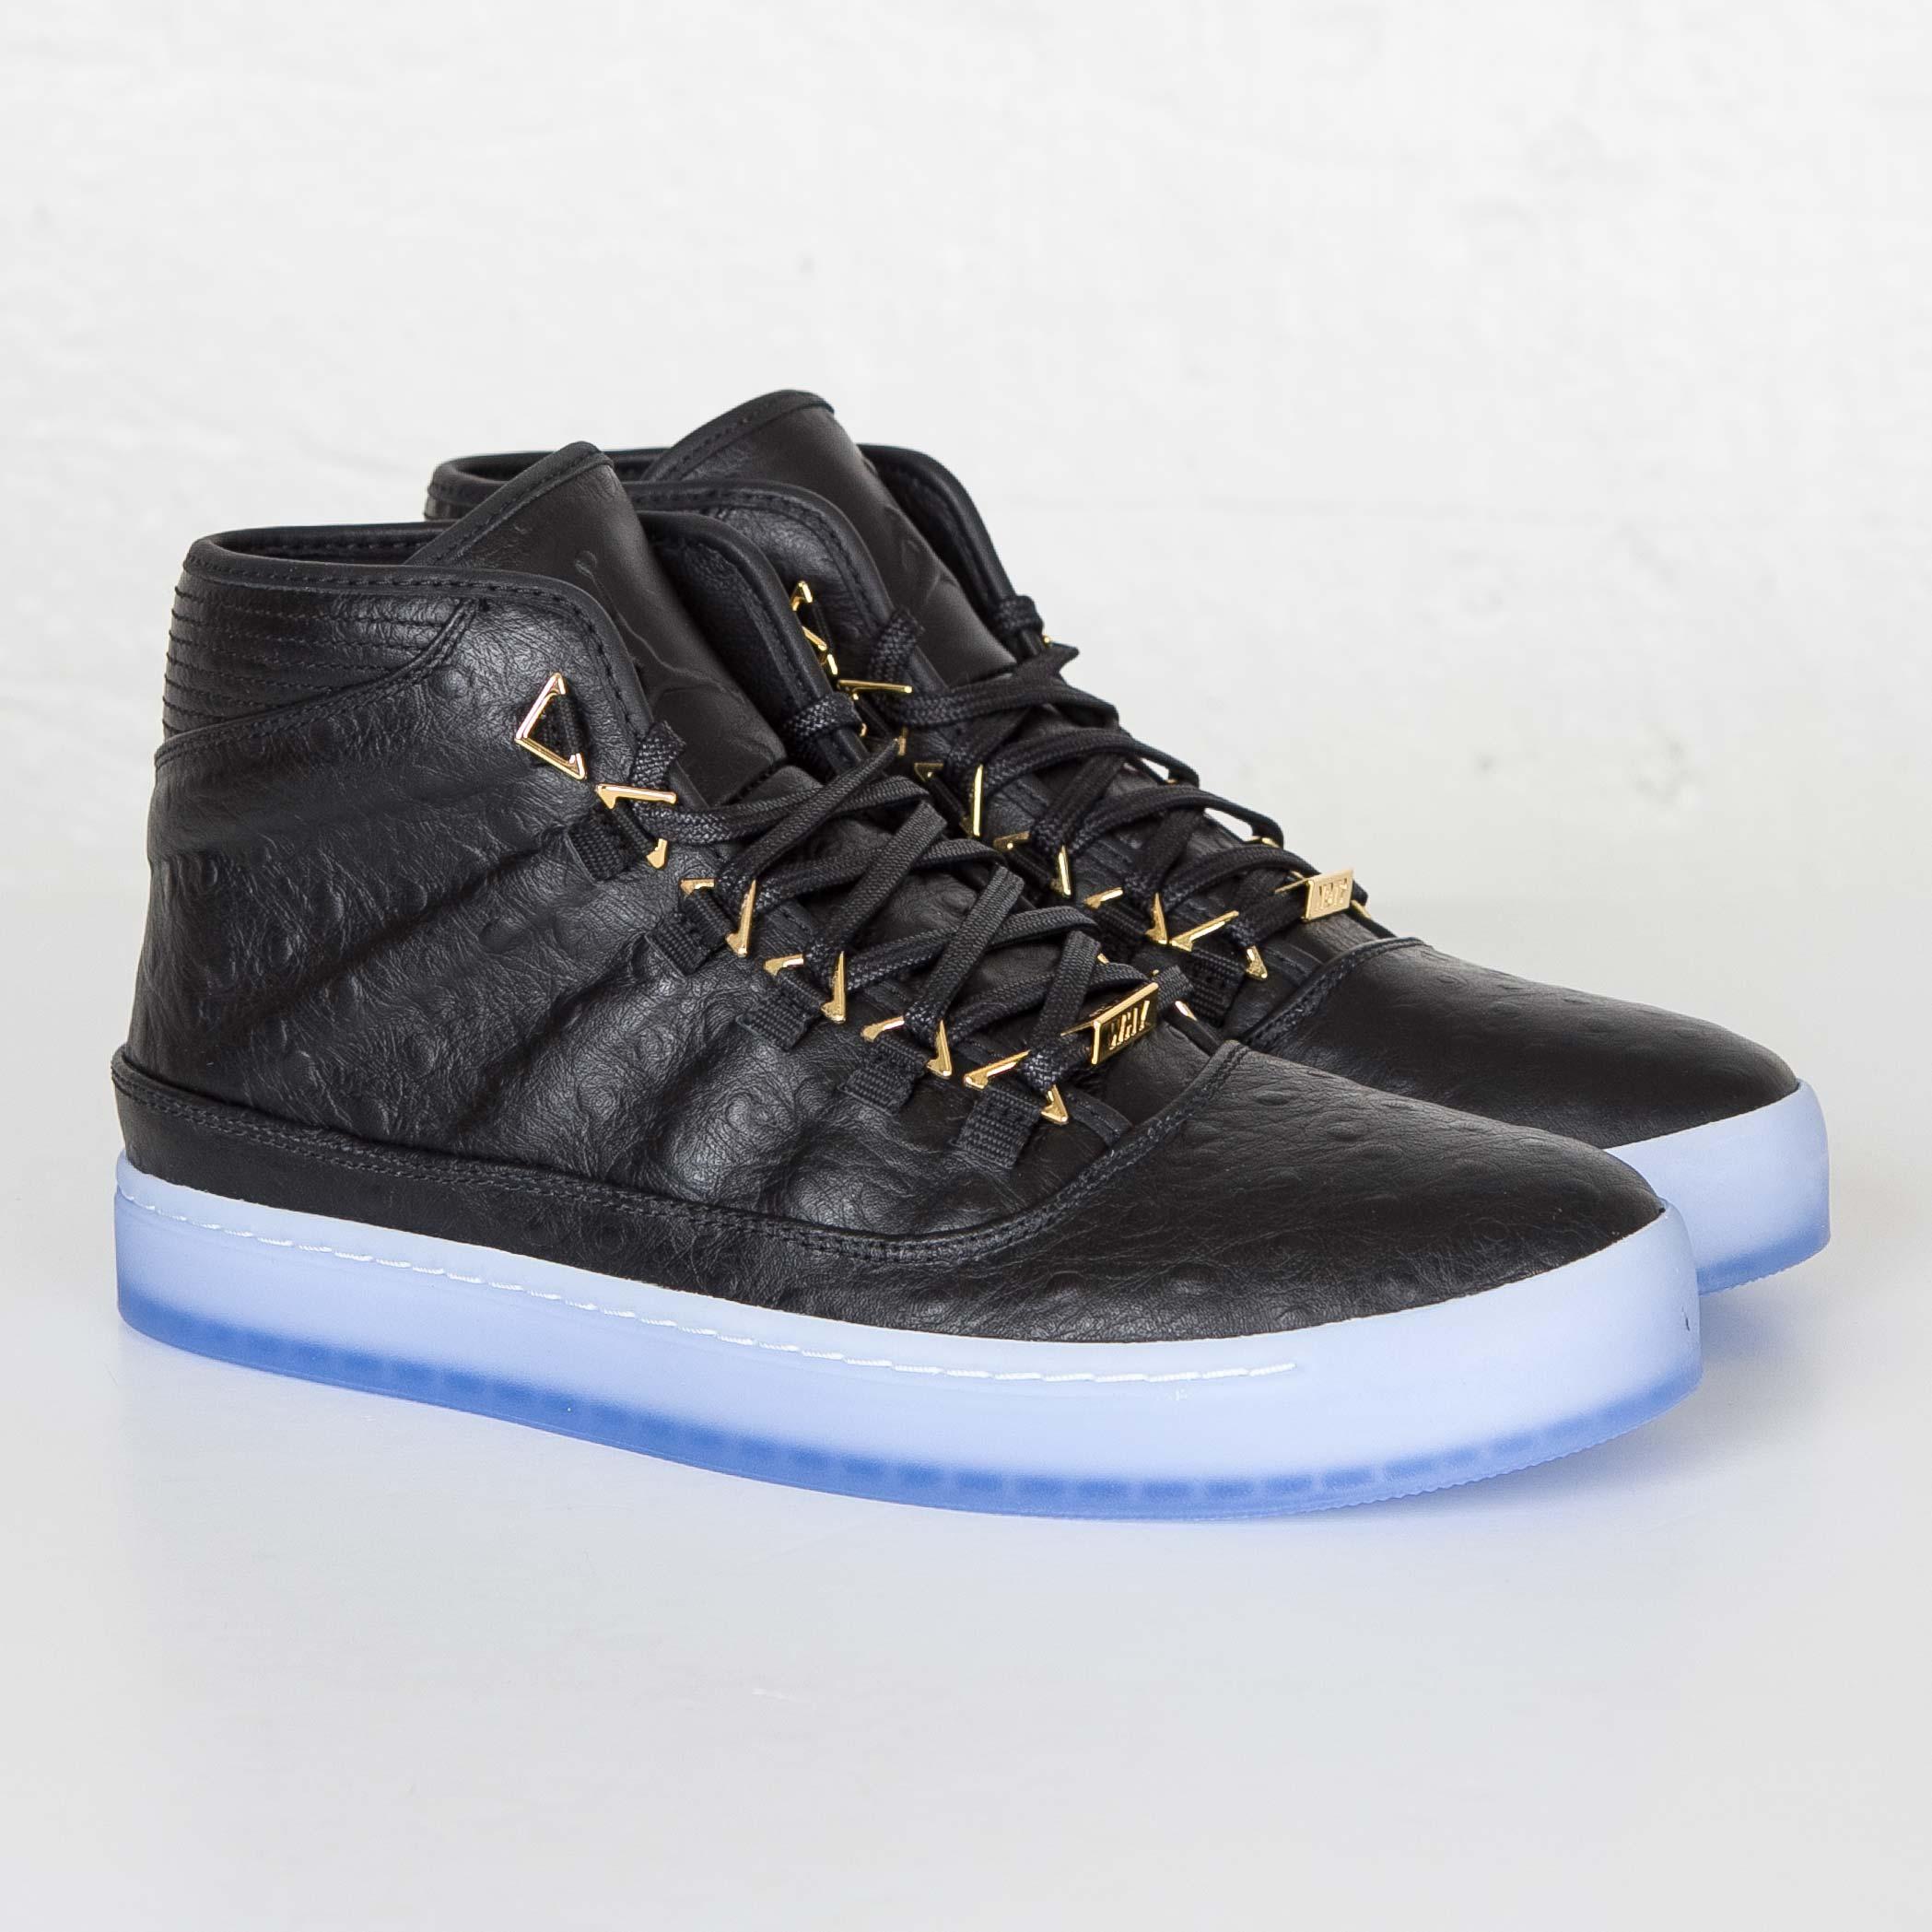 Jordan Brand Jordan Westbrook 0 Premium - 838817-035 ... 234d4781f1d